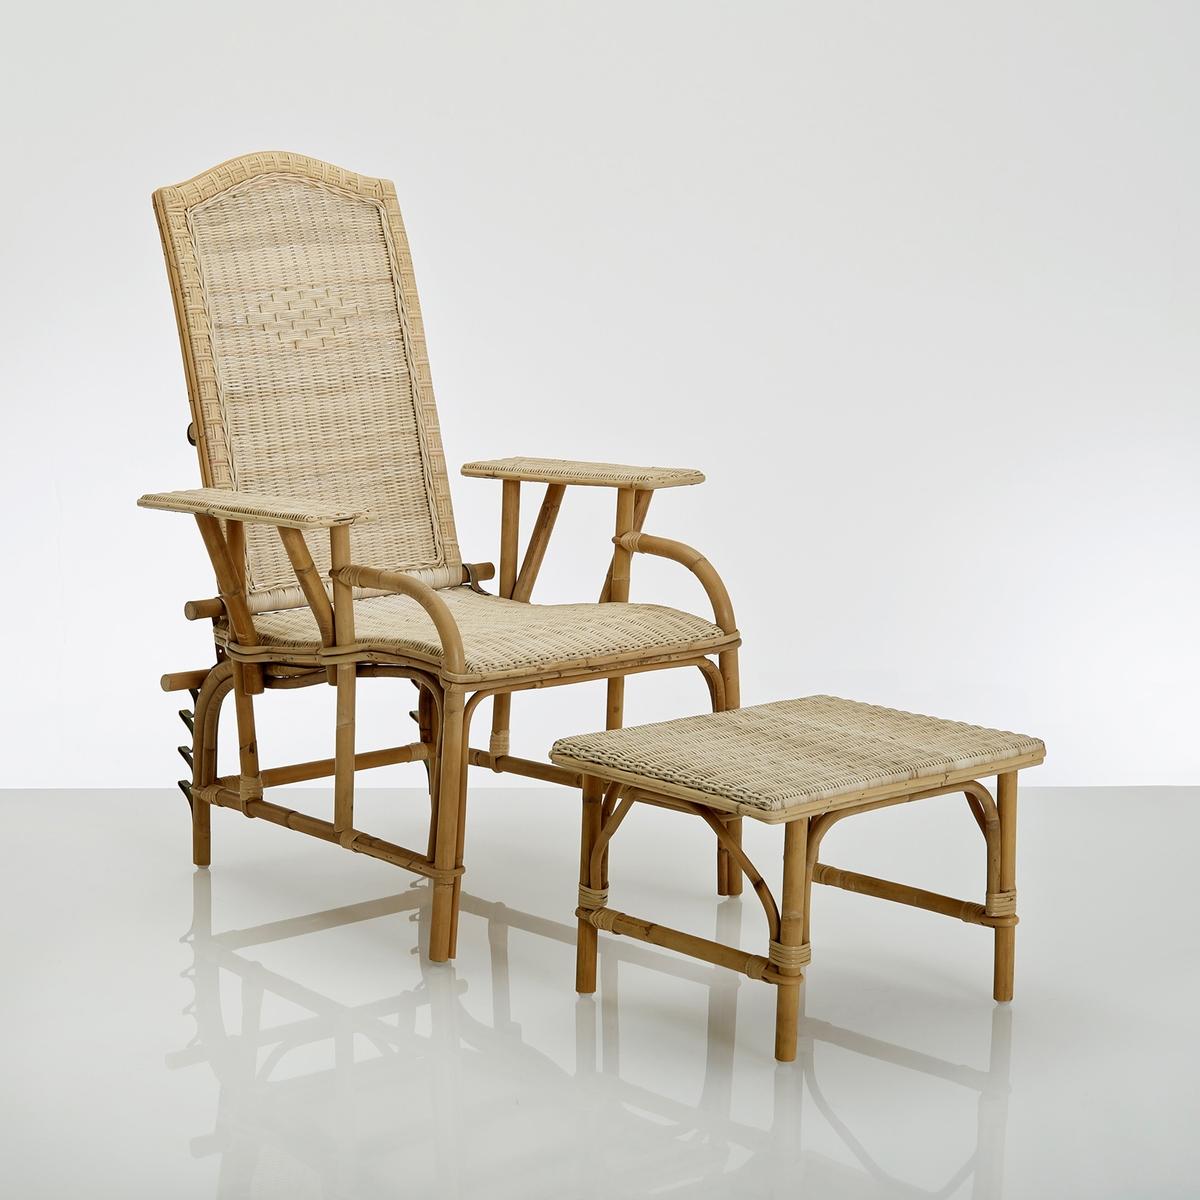 Chaise longue+ riposa-piedi in vimini, KOK,Nantucket